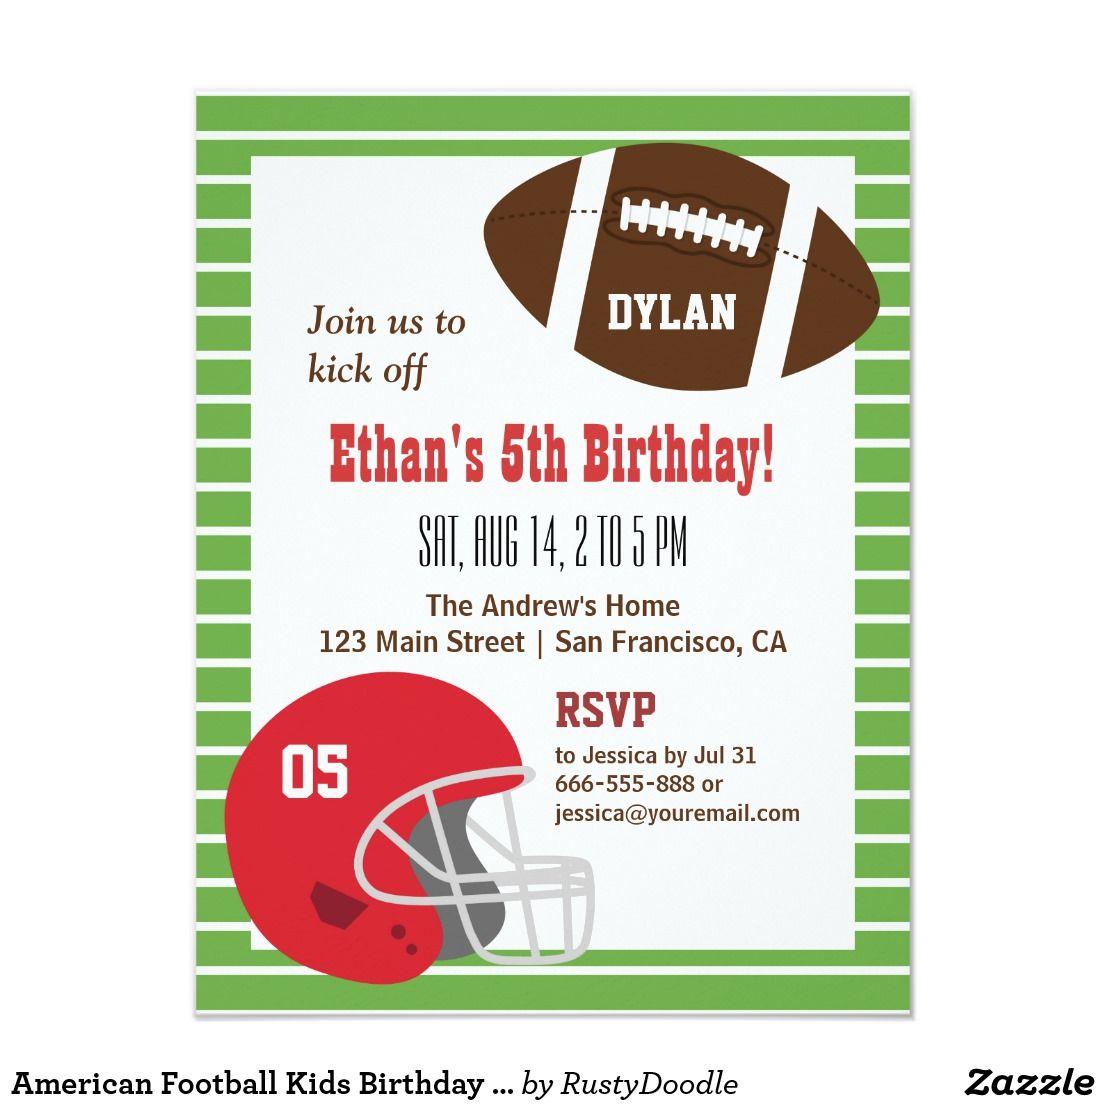 American Football Kids Birthday Party Invitations | Kids birthday ...